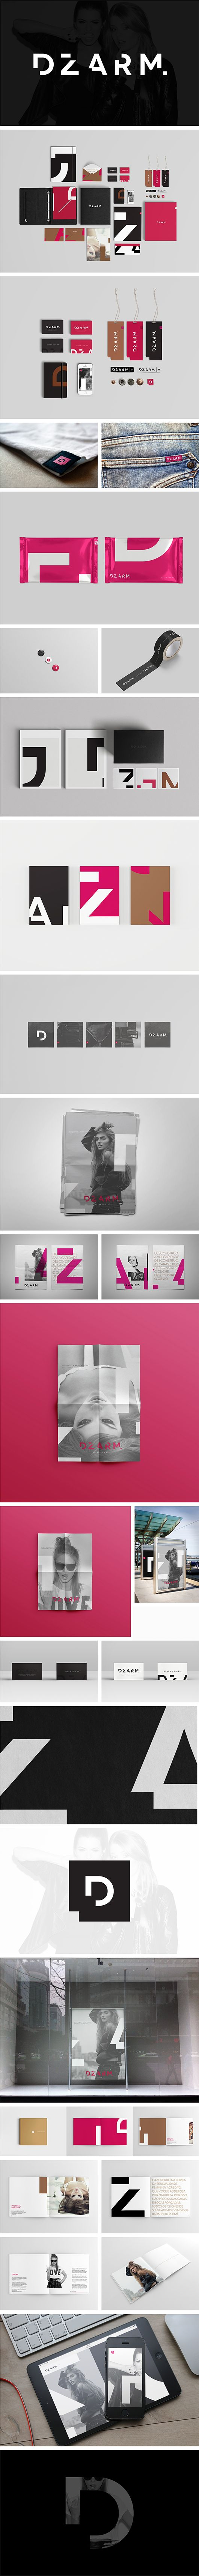 DZARM. – REBRANDING: Corporate Identity design system, Branding   Design by Diego Bellorin with Estúdio Colírio.